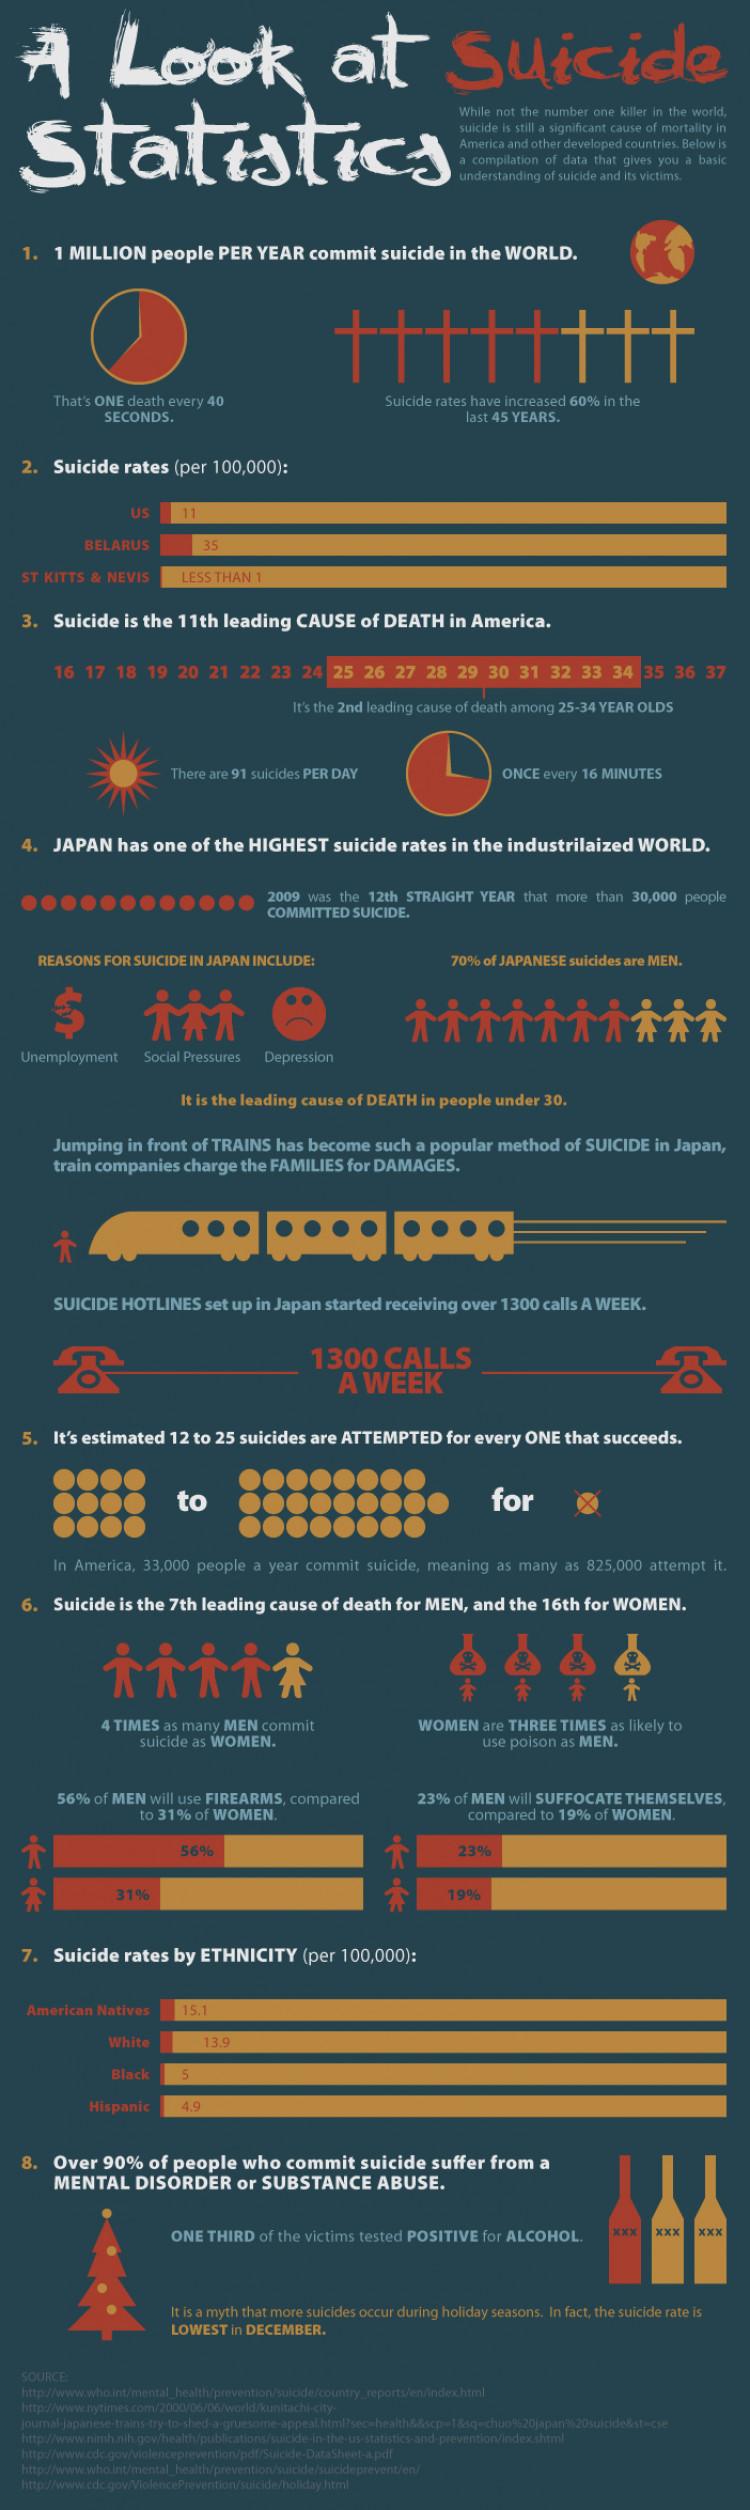 A Look at Suicide Statistics